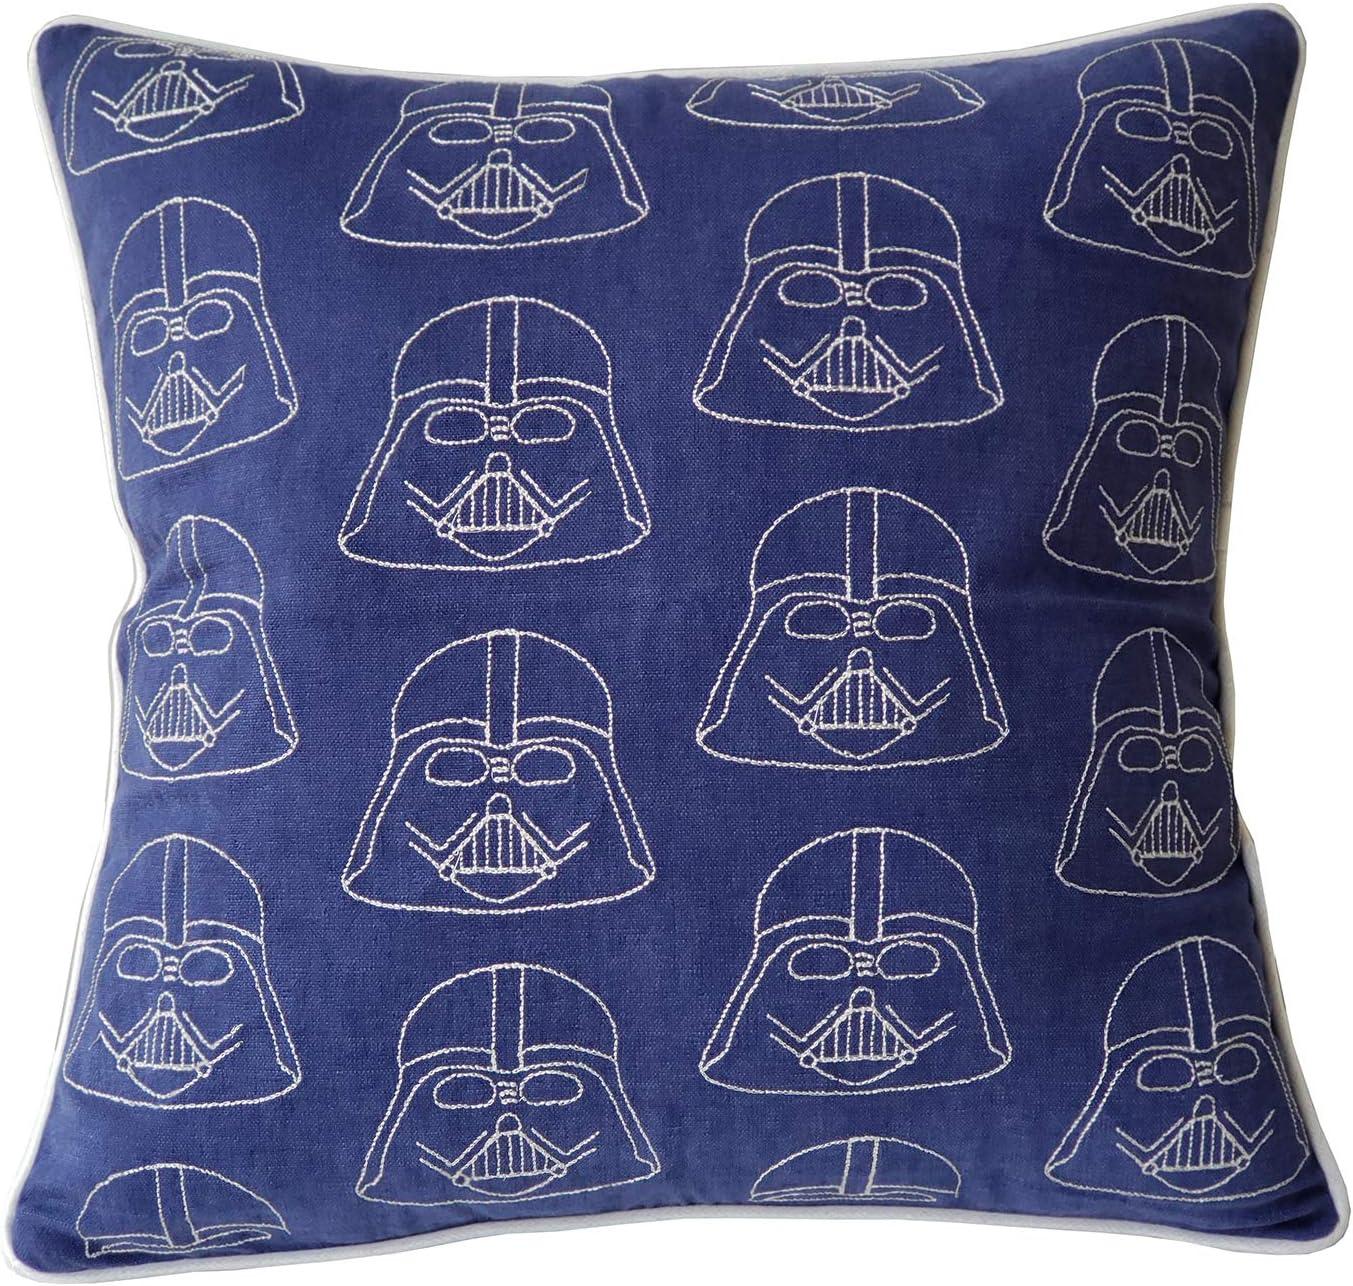 "EurasiaDecor DecorHouzz Darth Vader Star Wars Embroidered Pillow Cases Cushion Cover Teen Children Standard Decorative Gift Birthday Kids 18""x18"" (18X18, Darth Embroidered)"